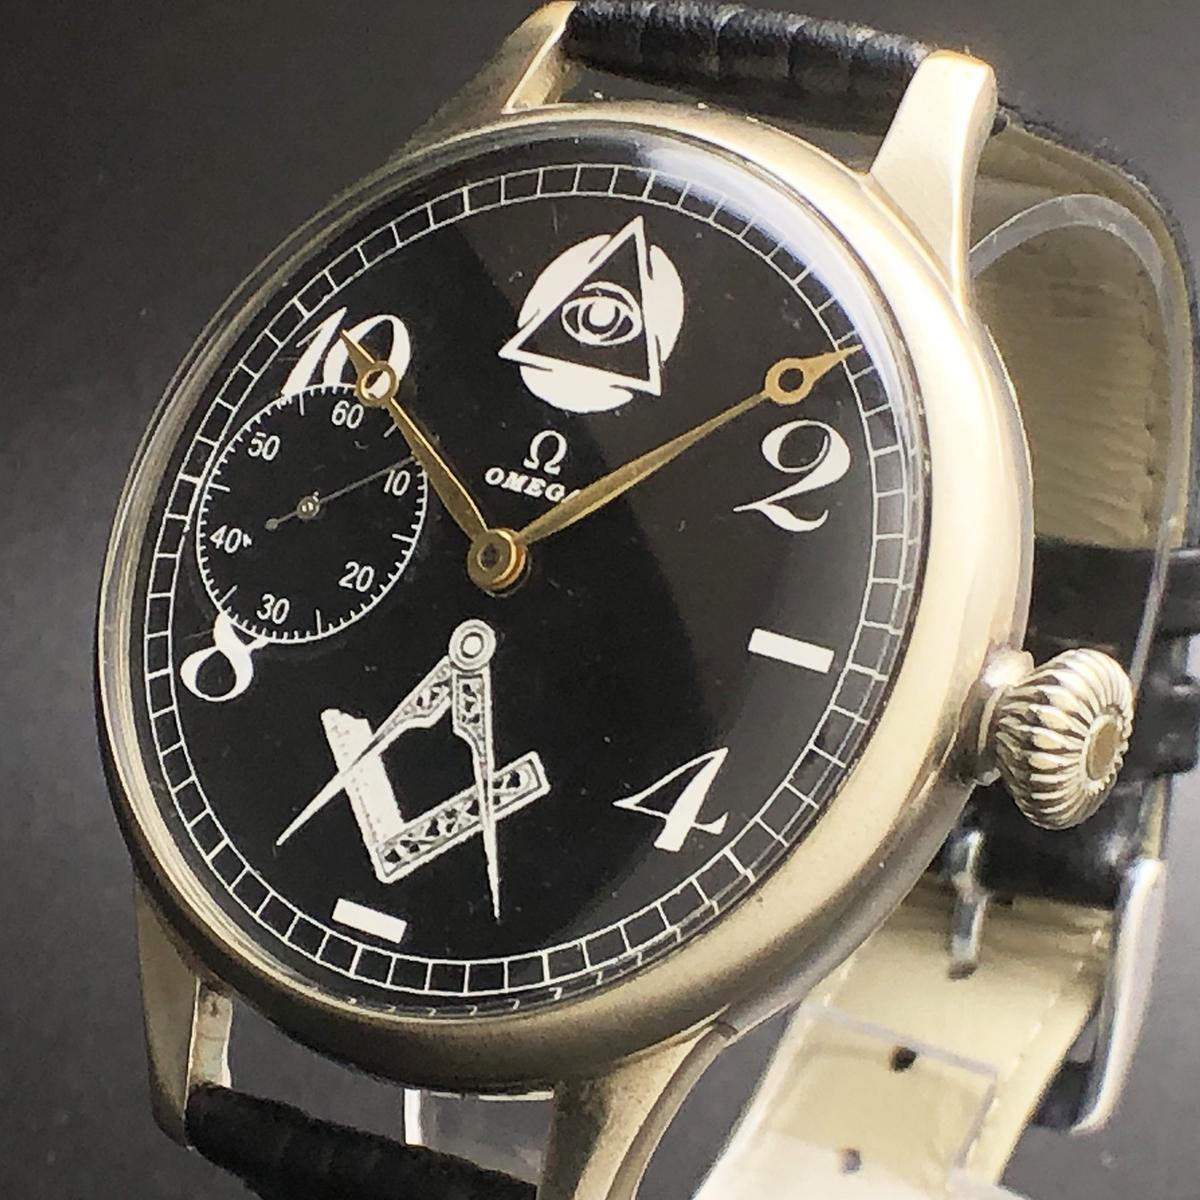 c4a333652a 激レア OMEGA オメガ フリーメイソン 1930s アンティーク メンズ 腕時計 大型 定規 コンパス 手巻